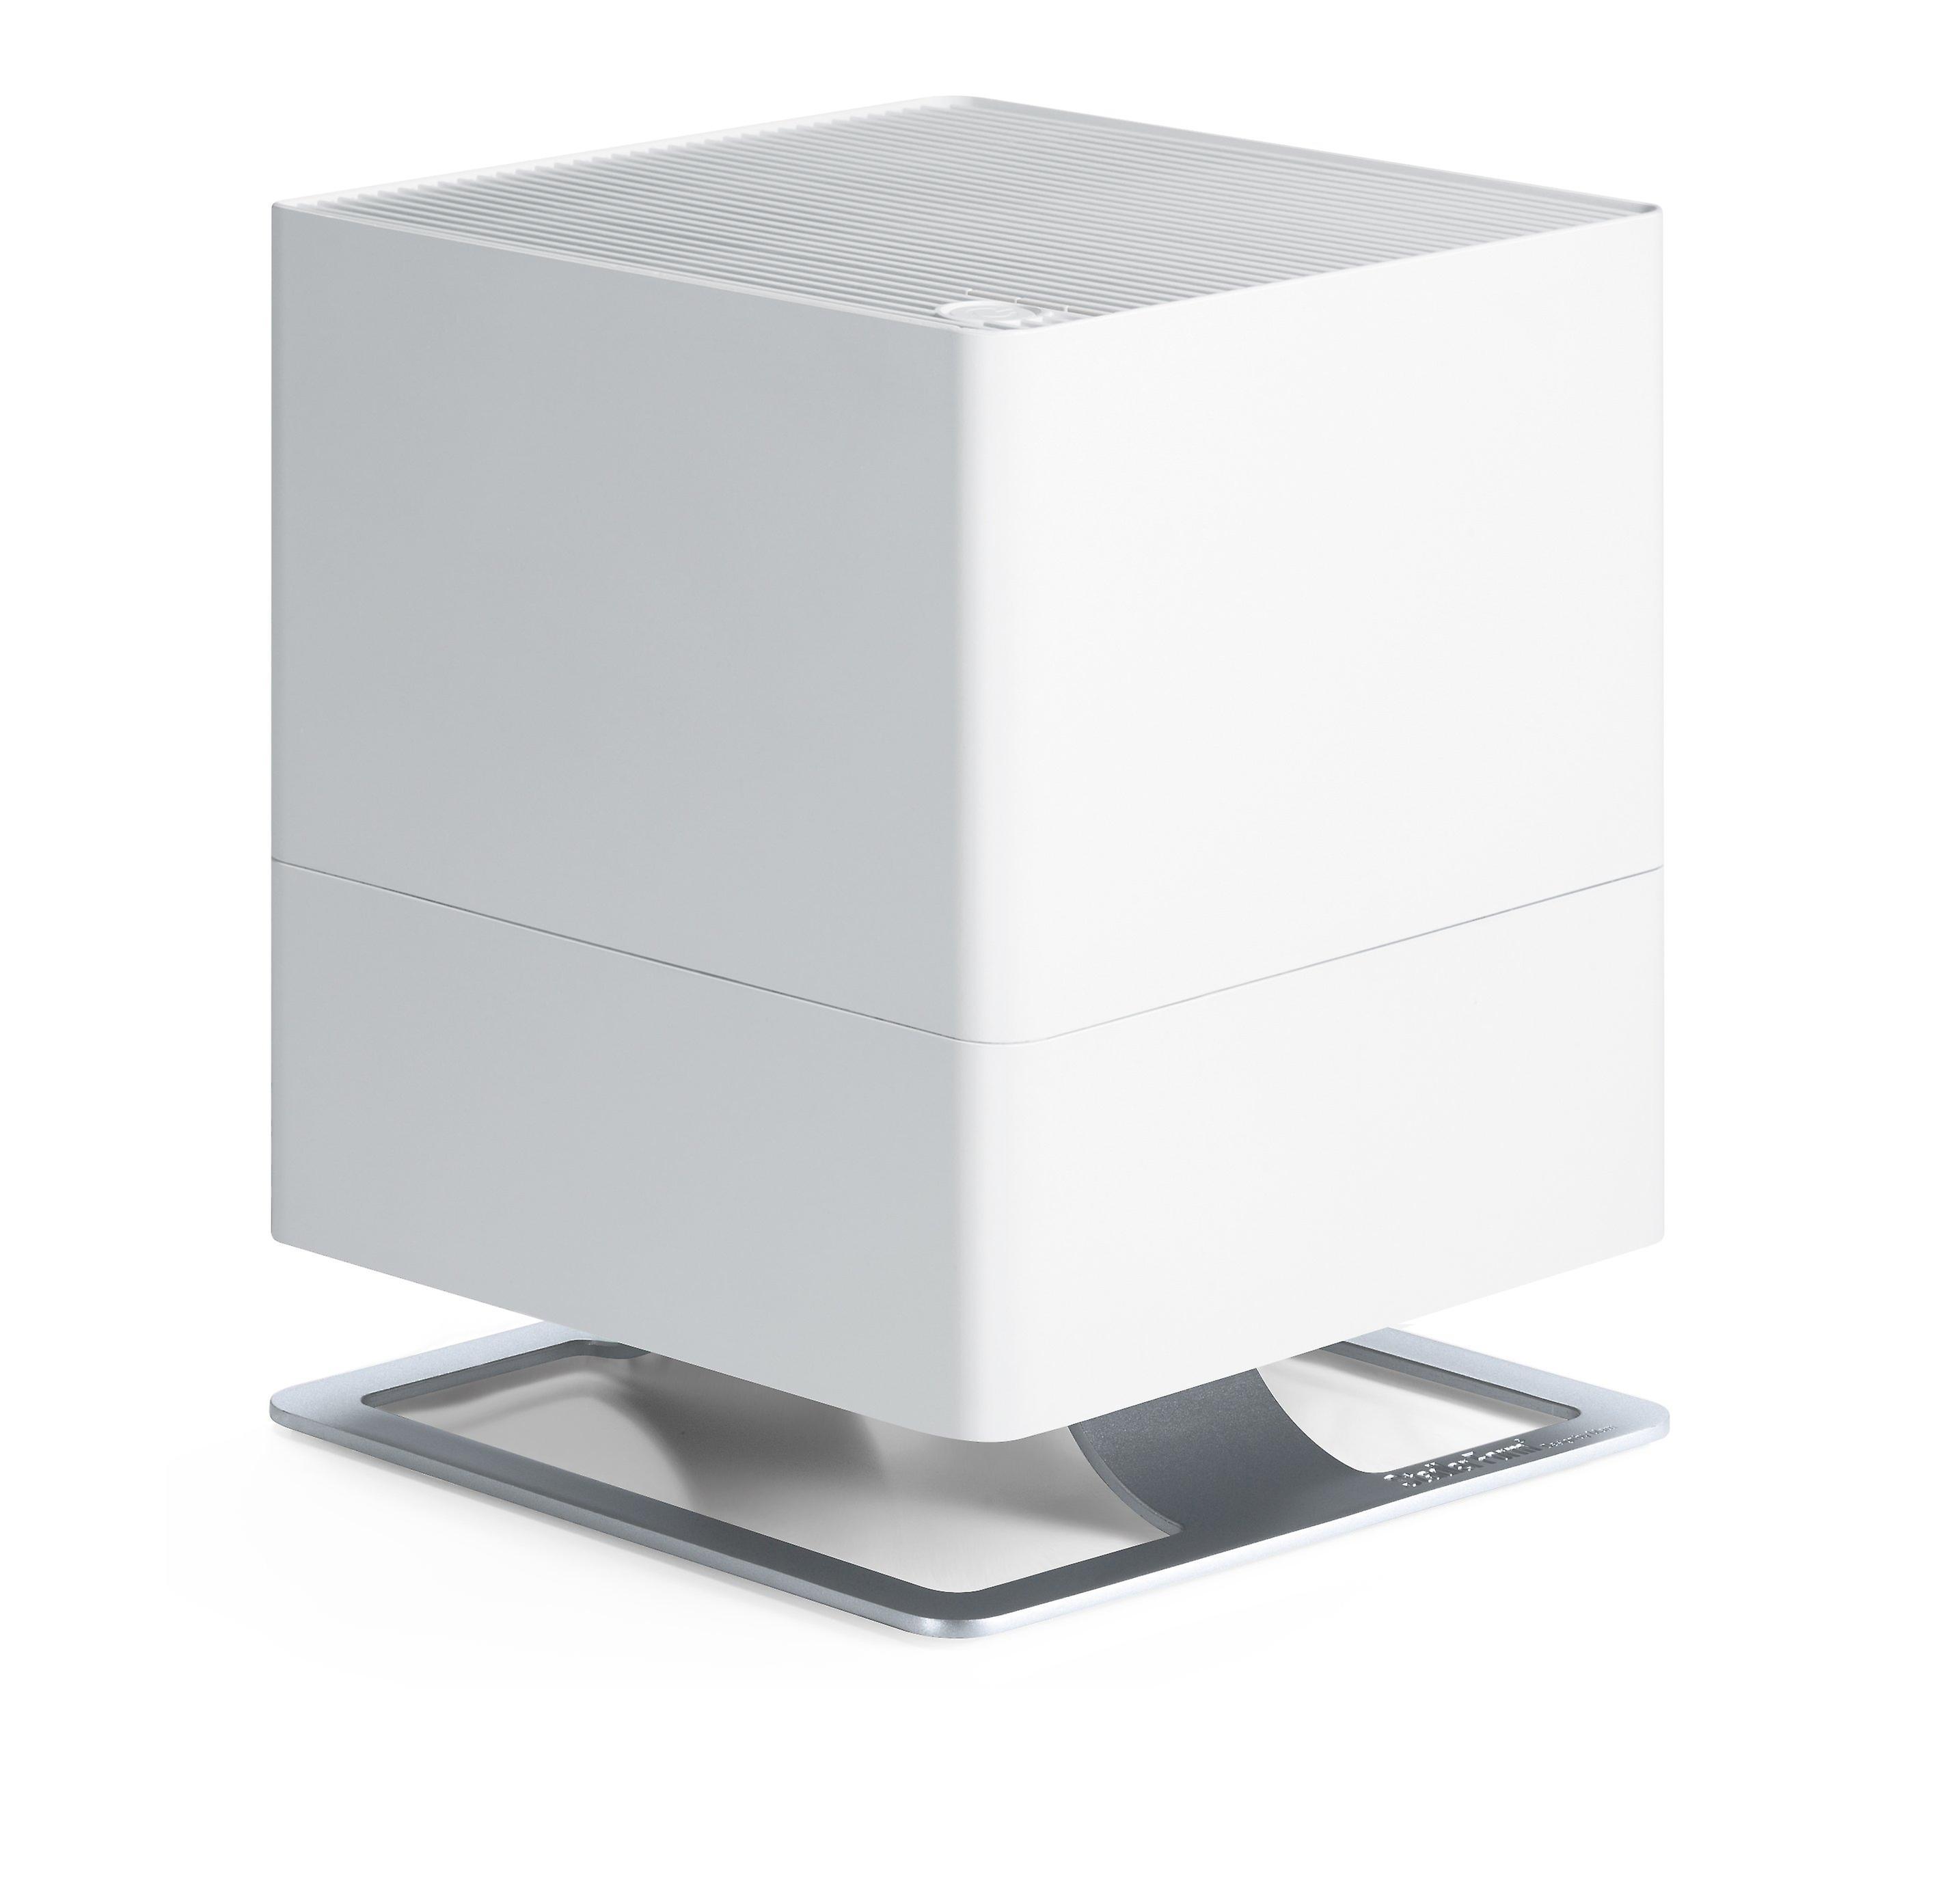 Stadler Form Oskar/Humidifier